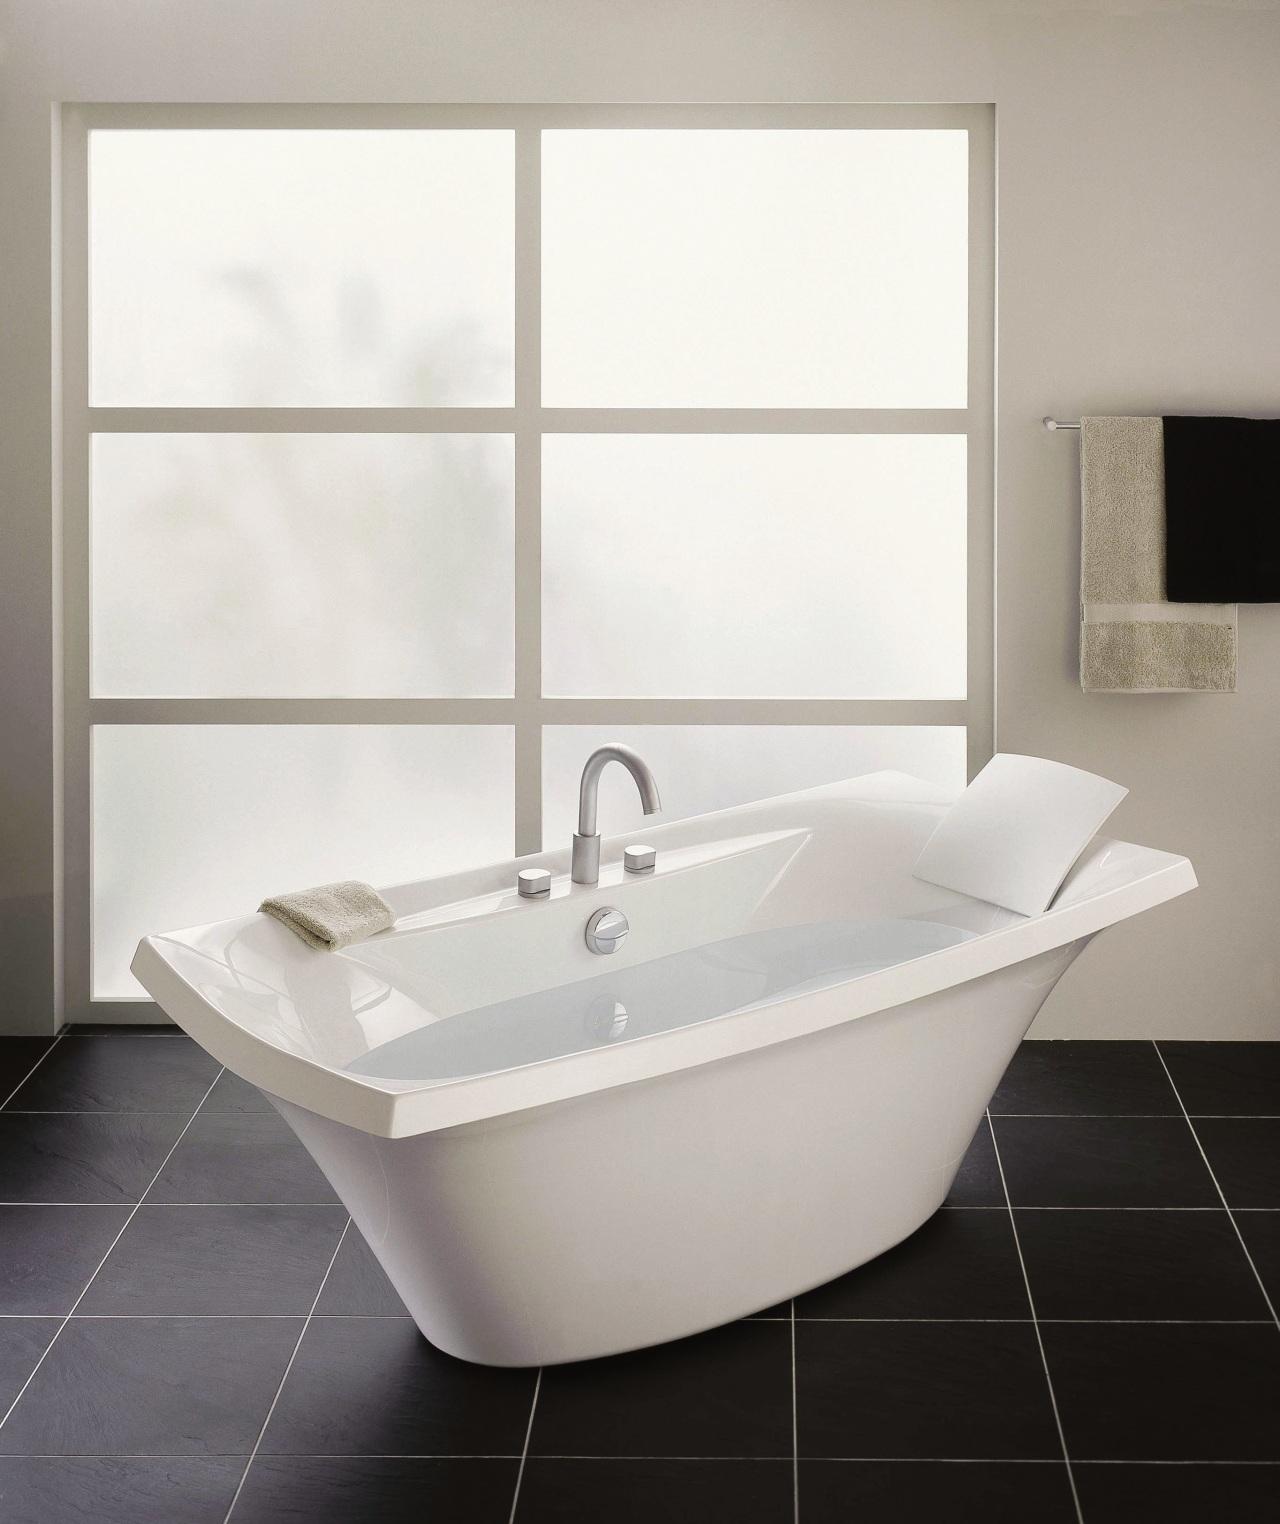 View of this bathroom angle, bathroom, bathroom accessory, bathroom cabinet, bathroom sink, bathtub, bidet, ceramic, interior design, plumbing fixture, product, product design, sink, tap, toilet seat, gray